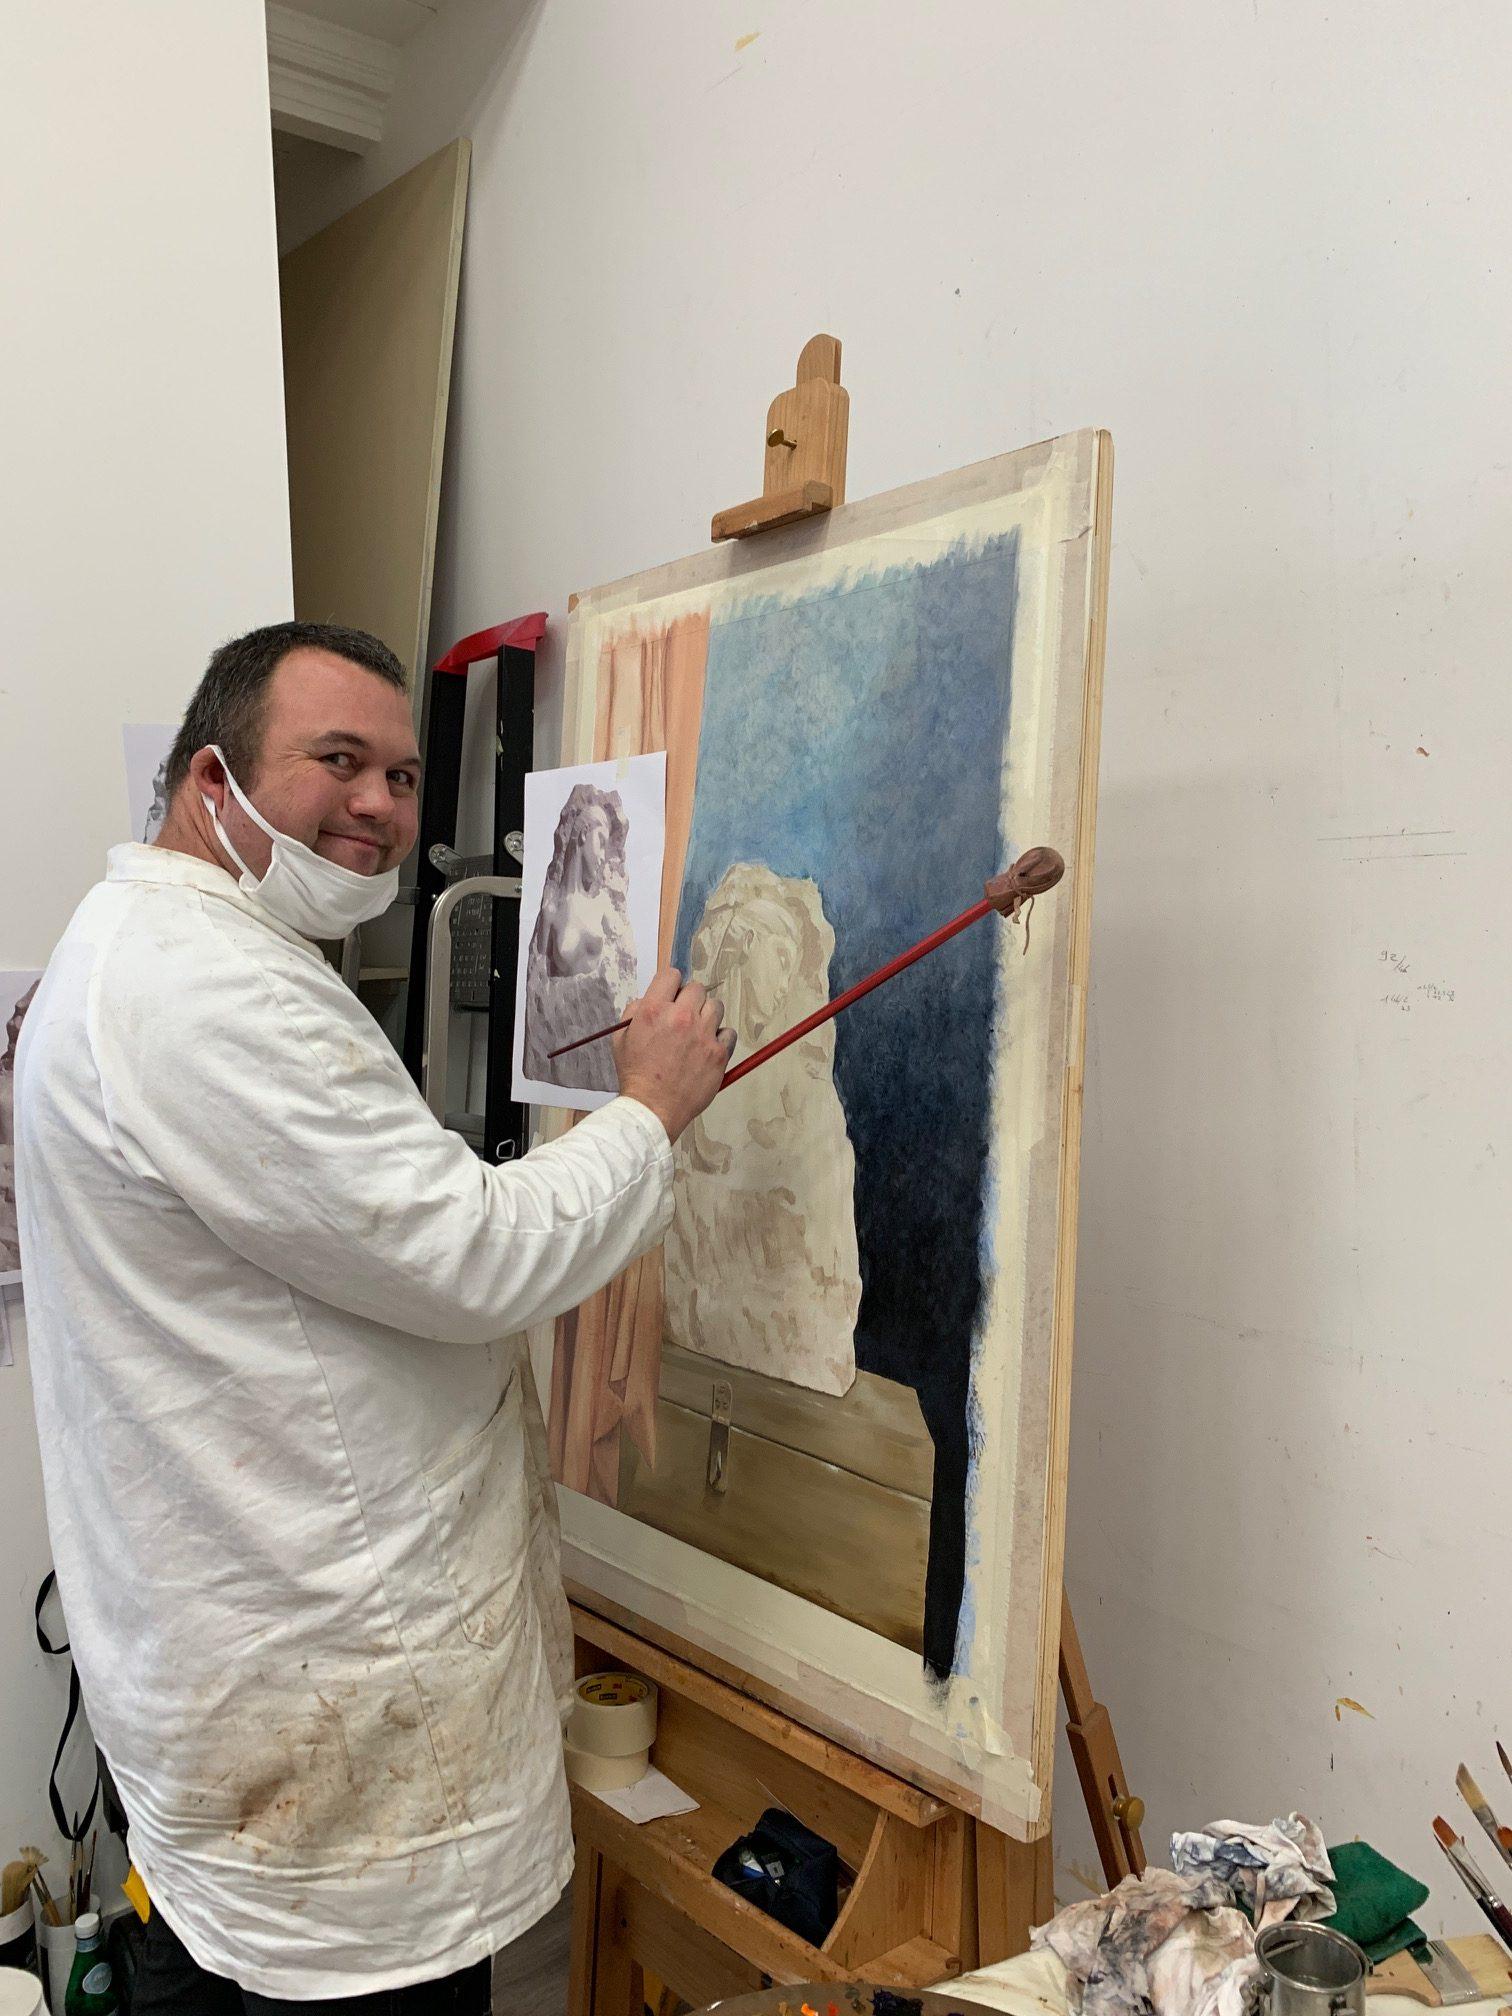 Nicolas druelle artisan d'art